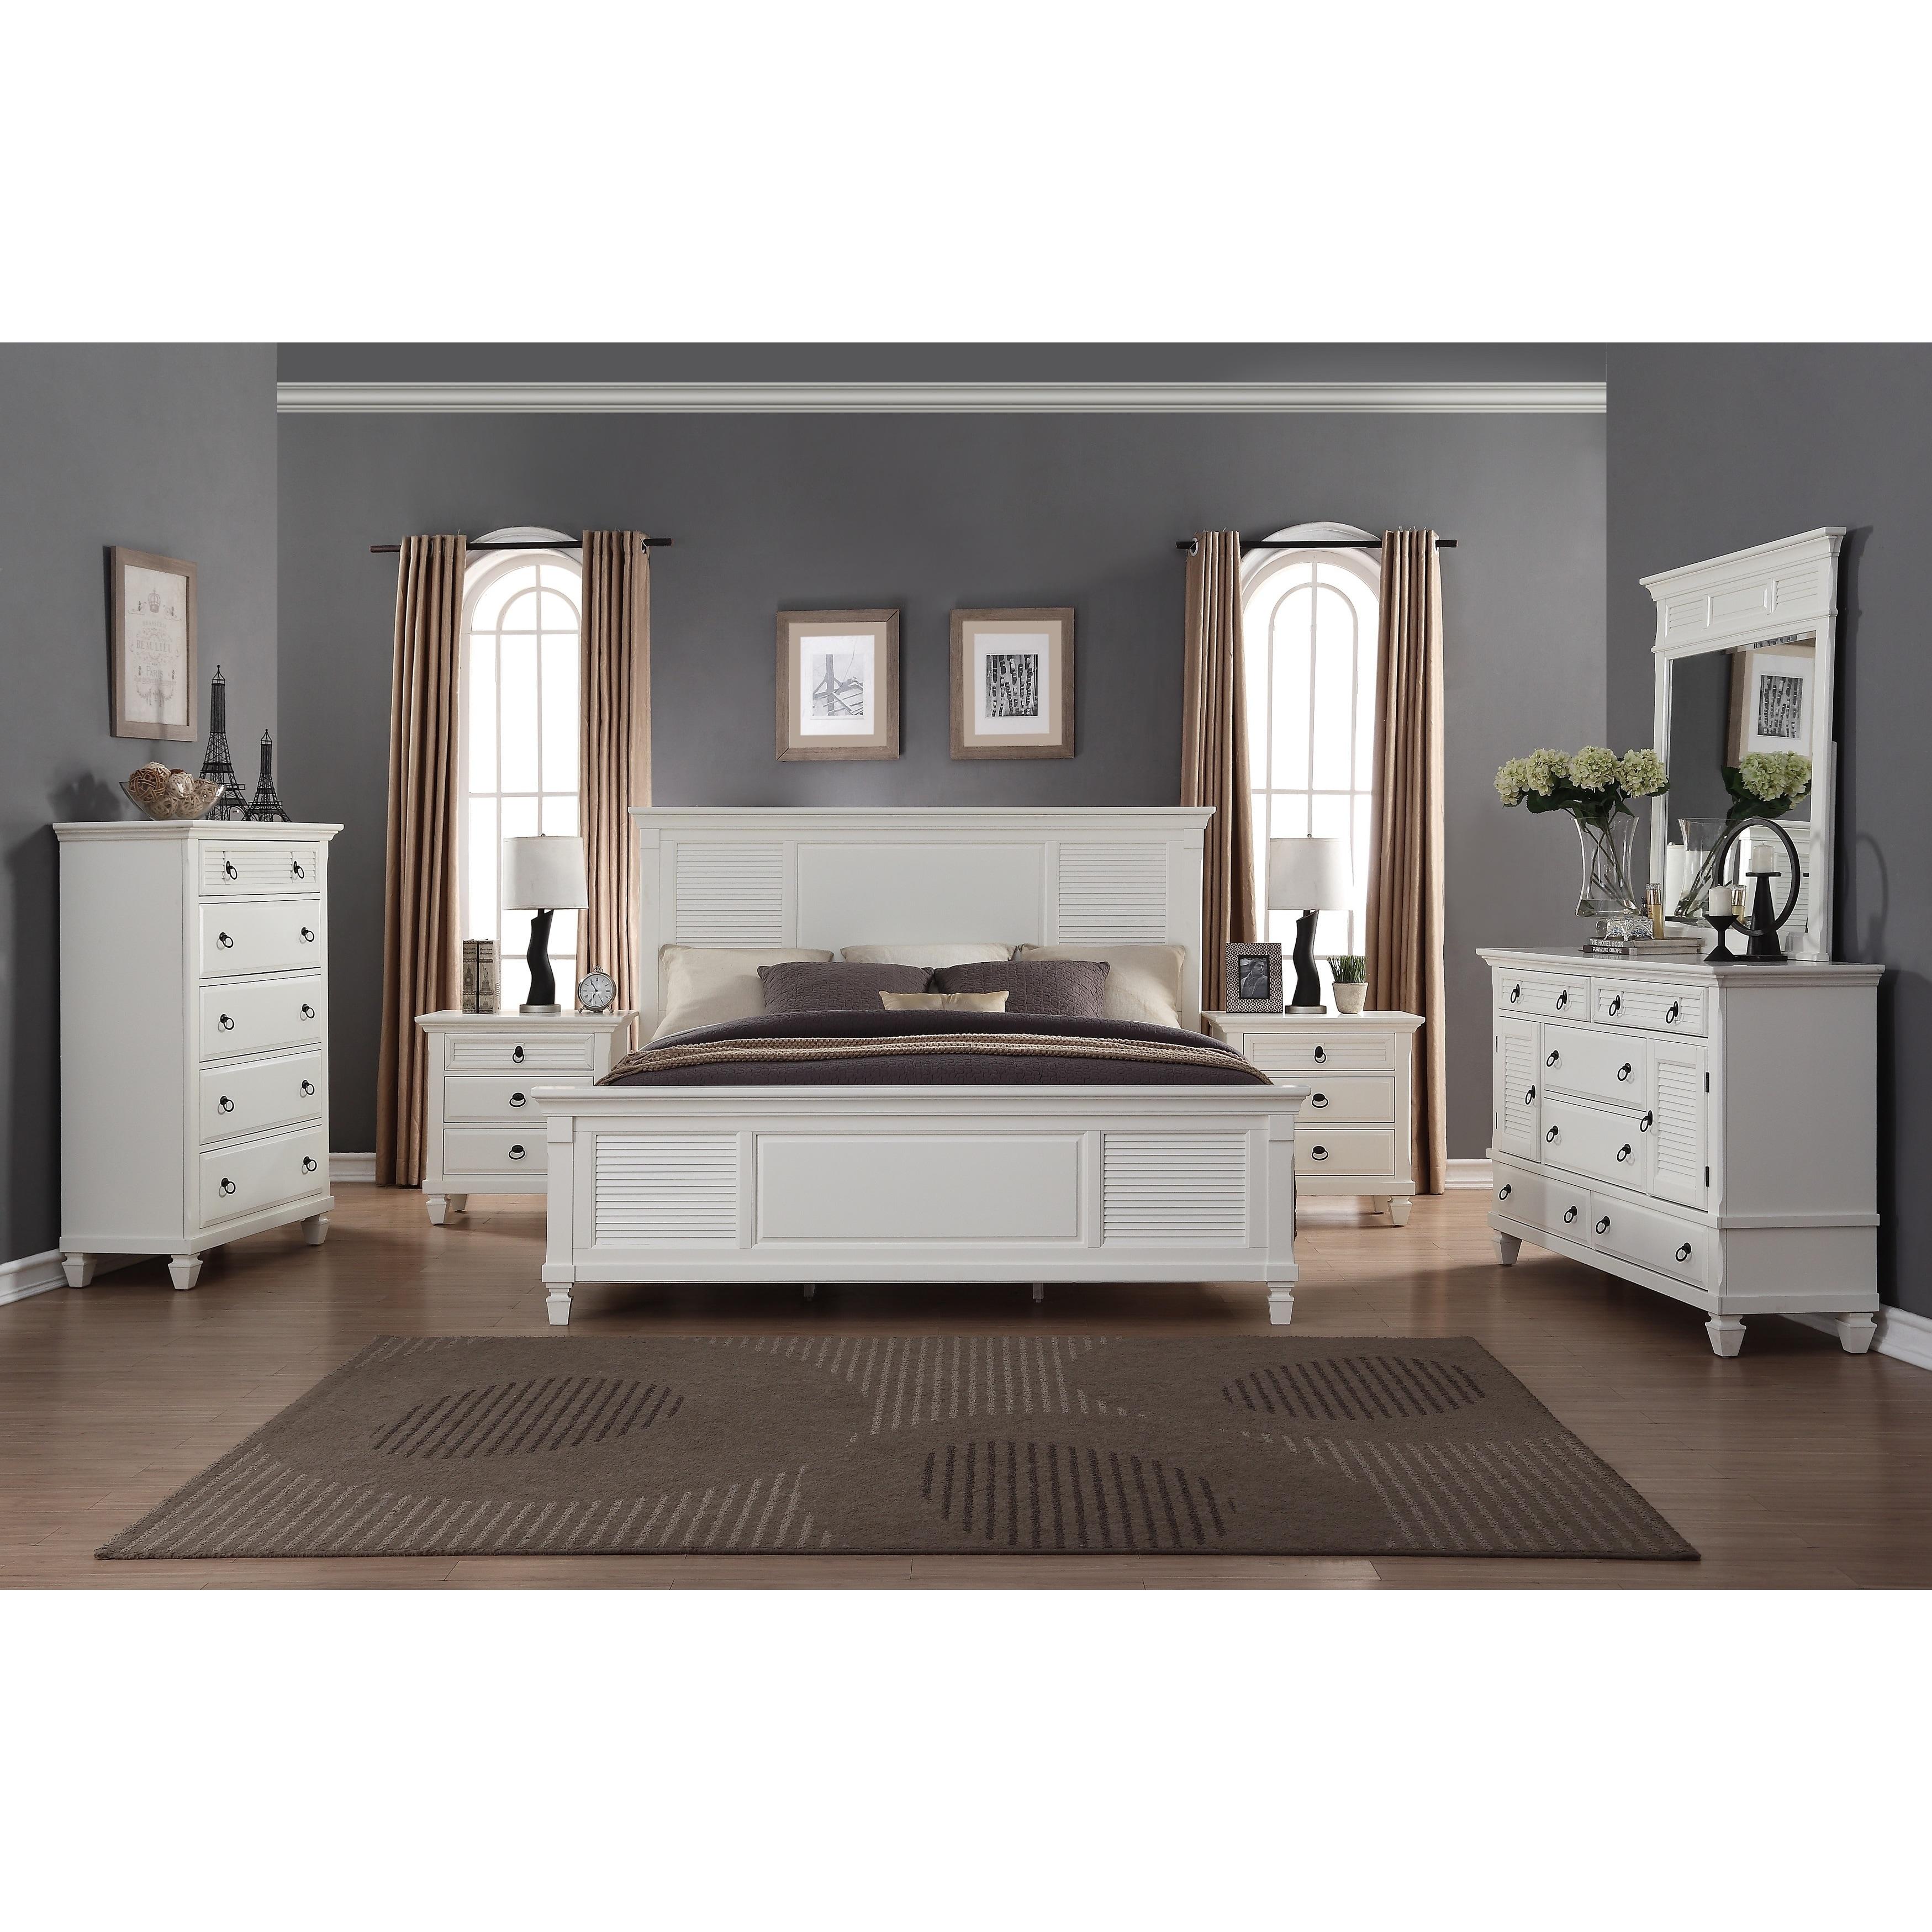 Shop Regitina White 6 Piece King Size Bedroom Furniture Set